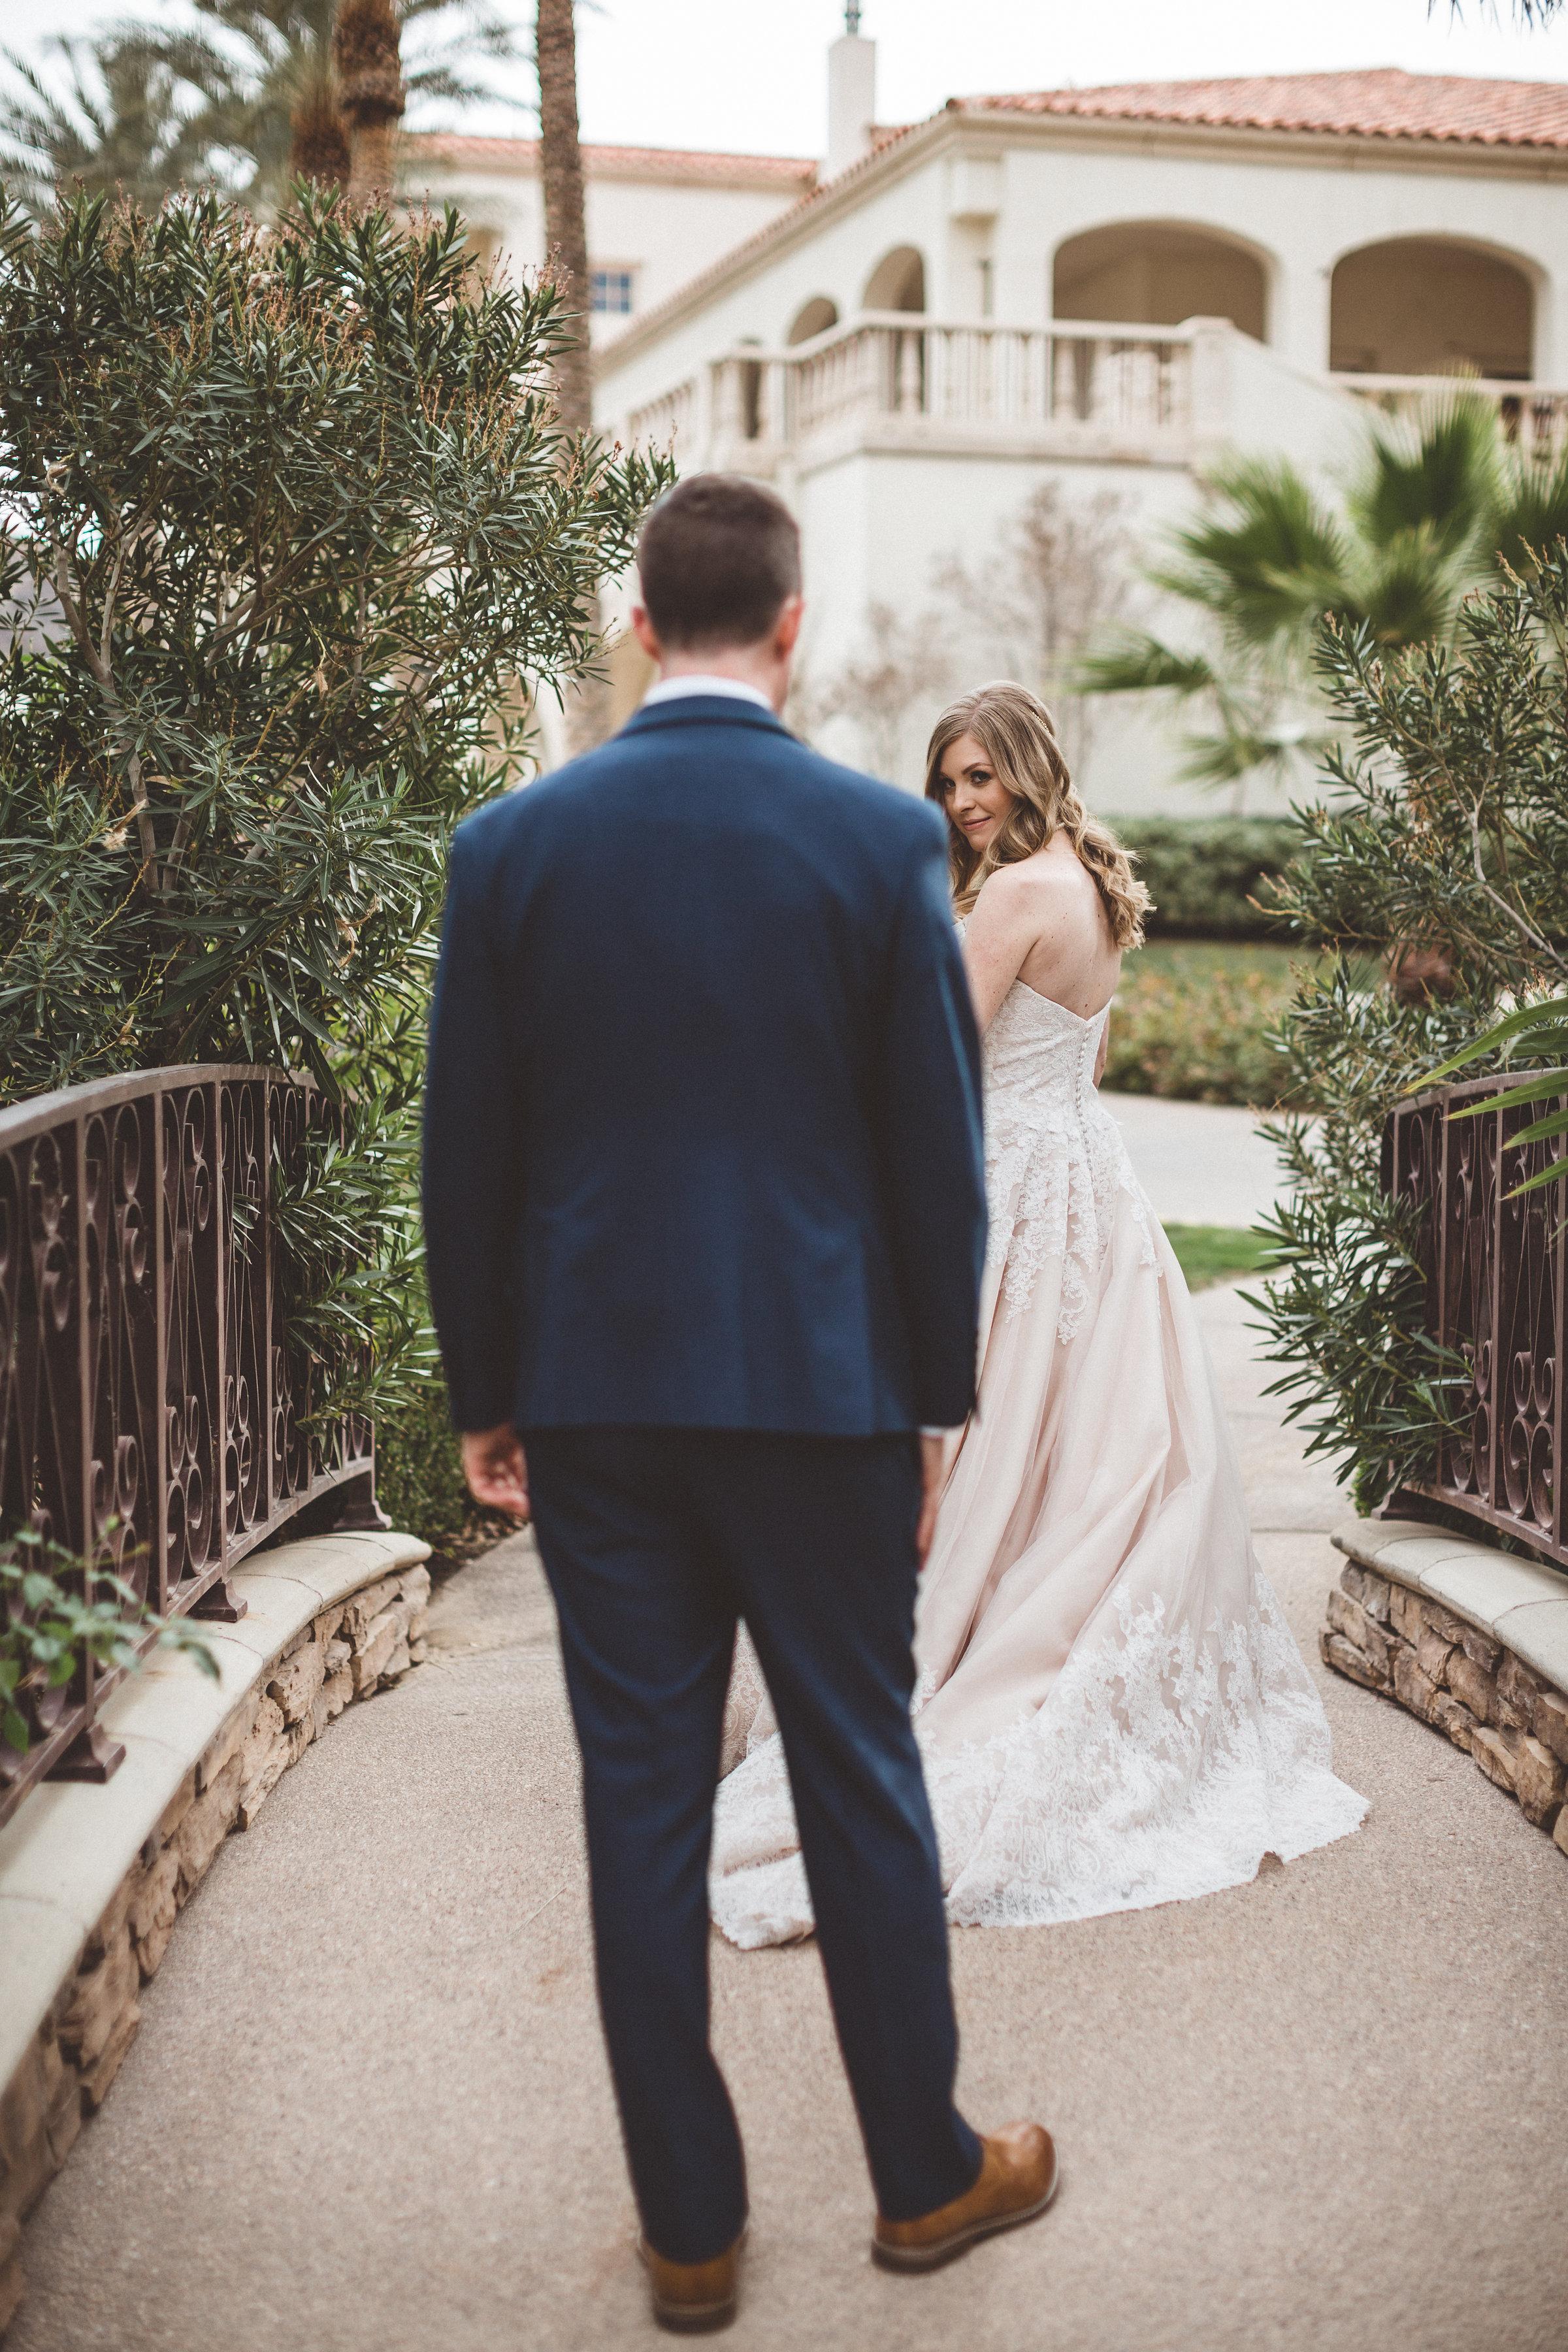 lindsey-and-ryan-intimate-winter-wedding15.jpg